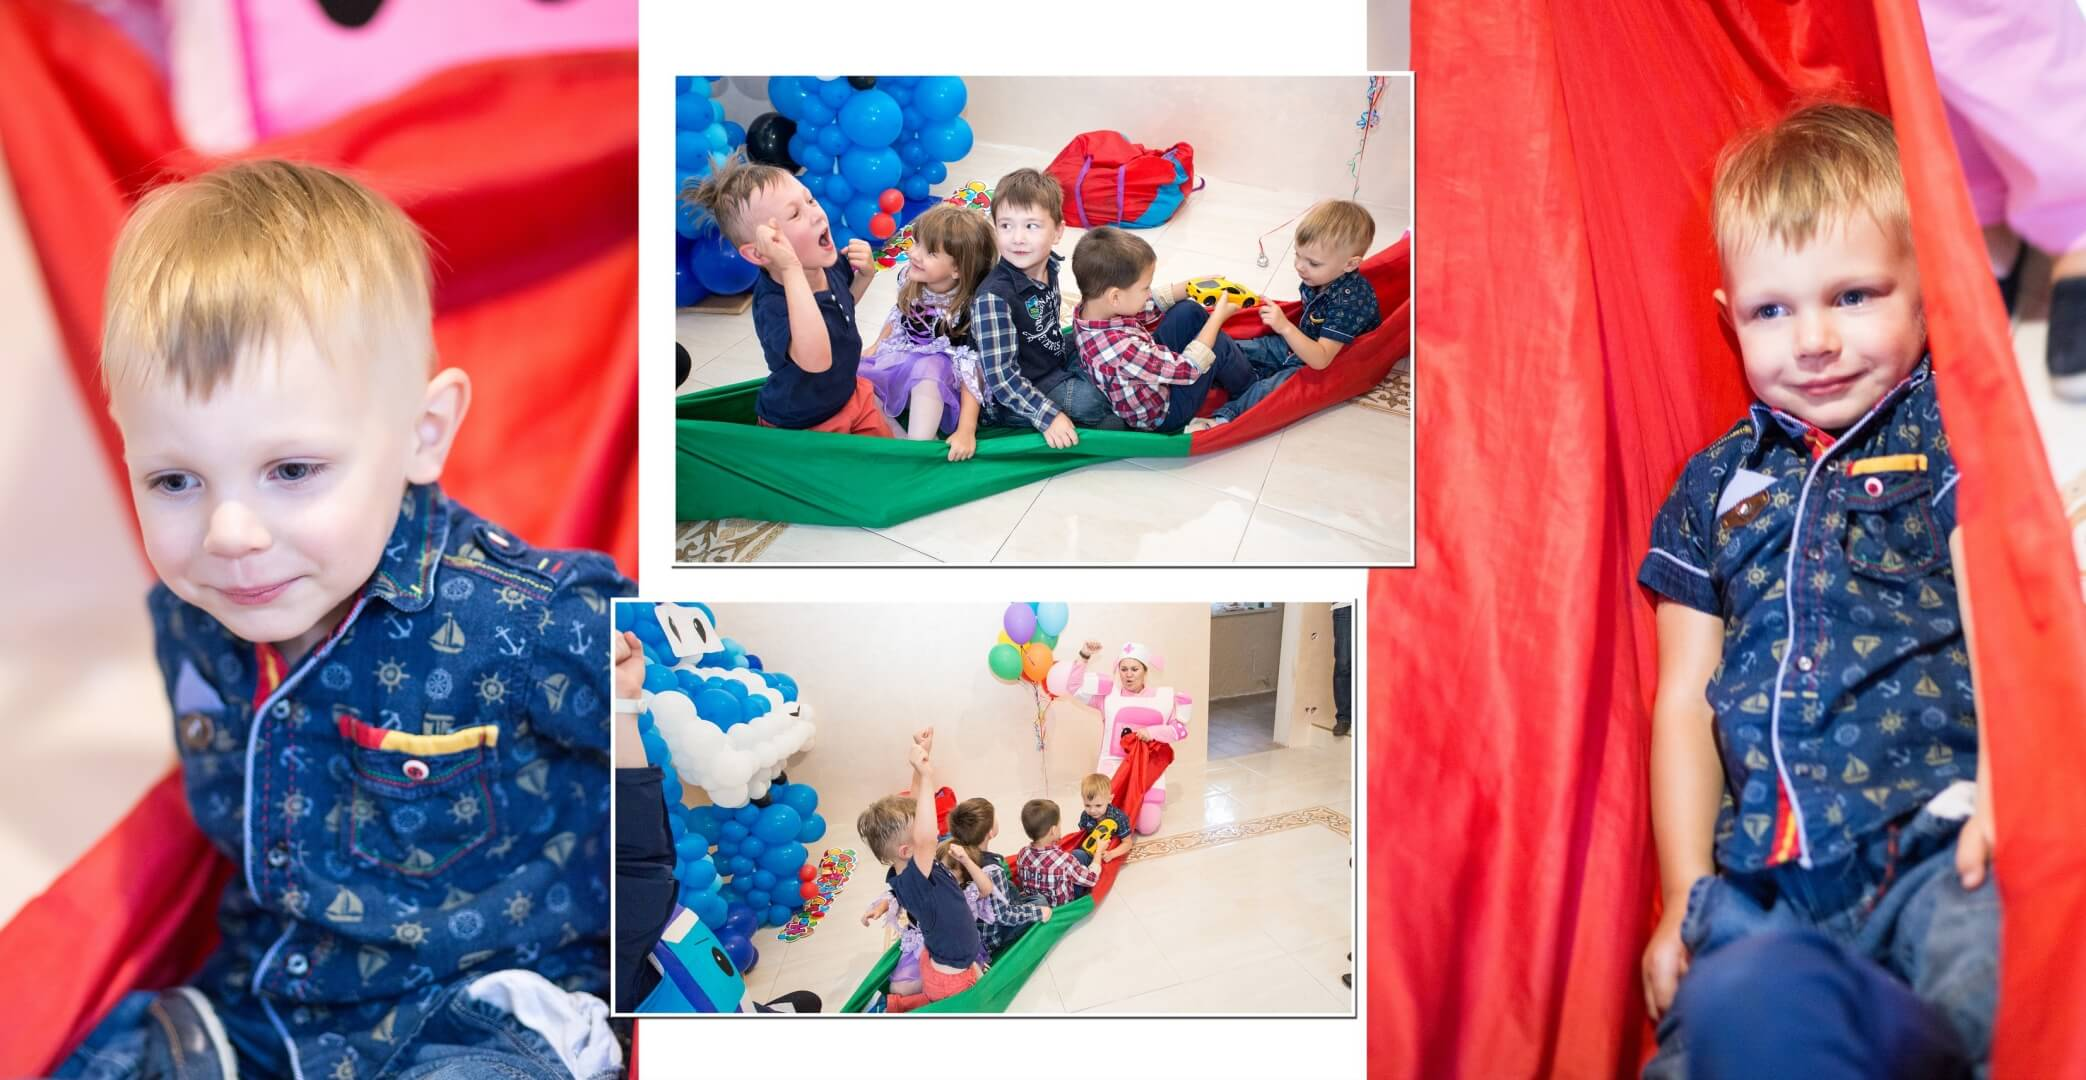 fotograf na detskij den' rozhdenija kiev videos#emka detskogo dnja rozhdenija zakazat' fotograf kiev nedorogo (1)